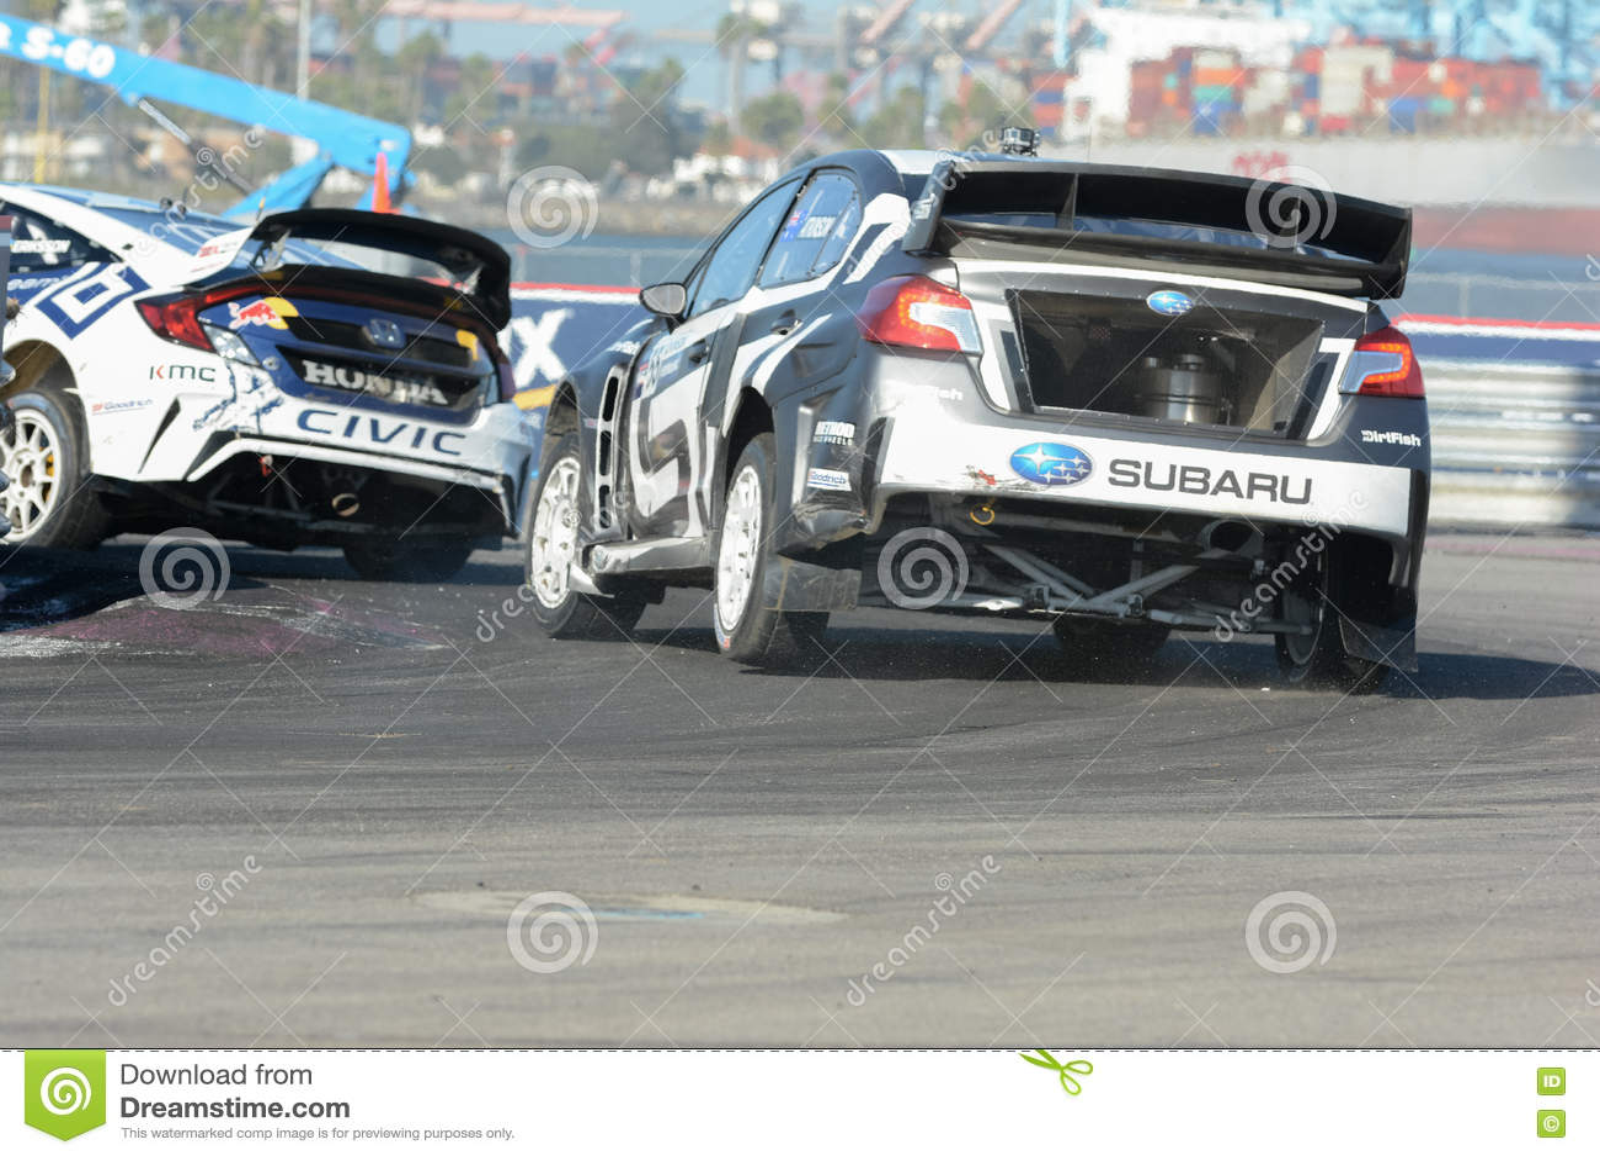 Chris Atkinson 55 Drives A Subaru Wrx Sti Car During The Red B